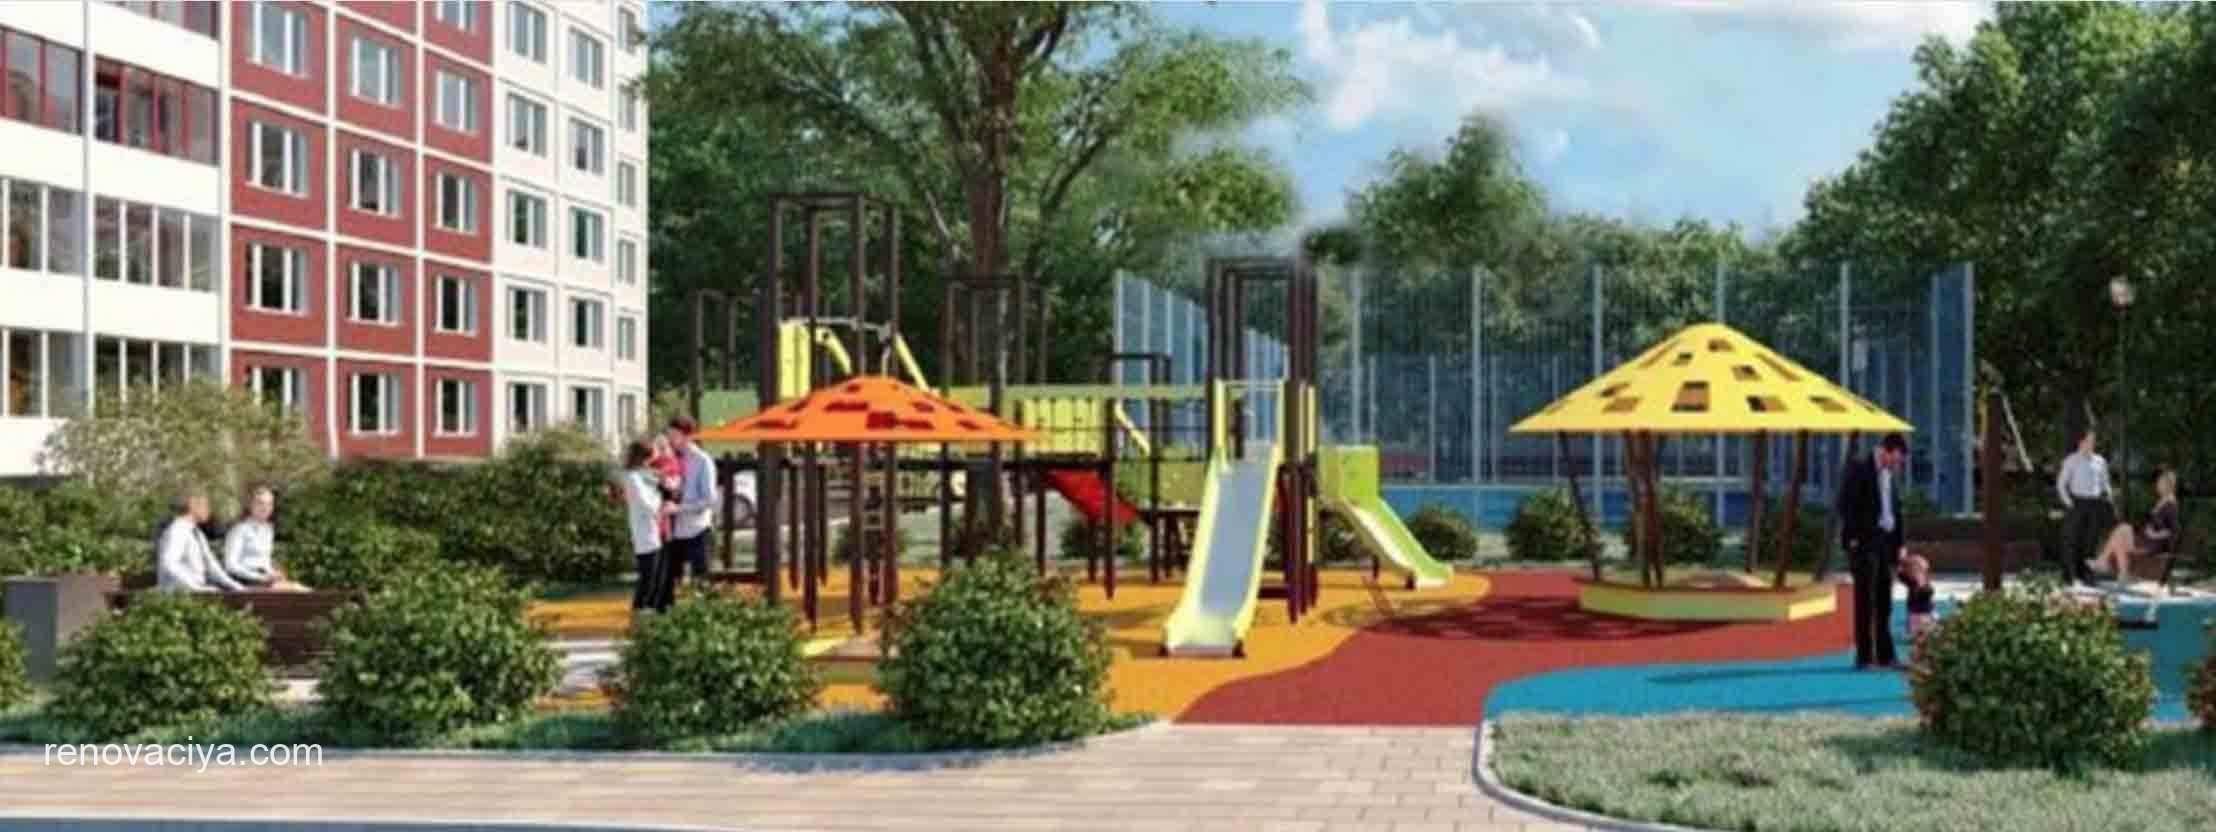 В Бутырском районе построят соцобъекты